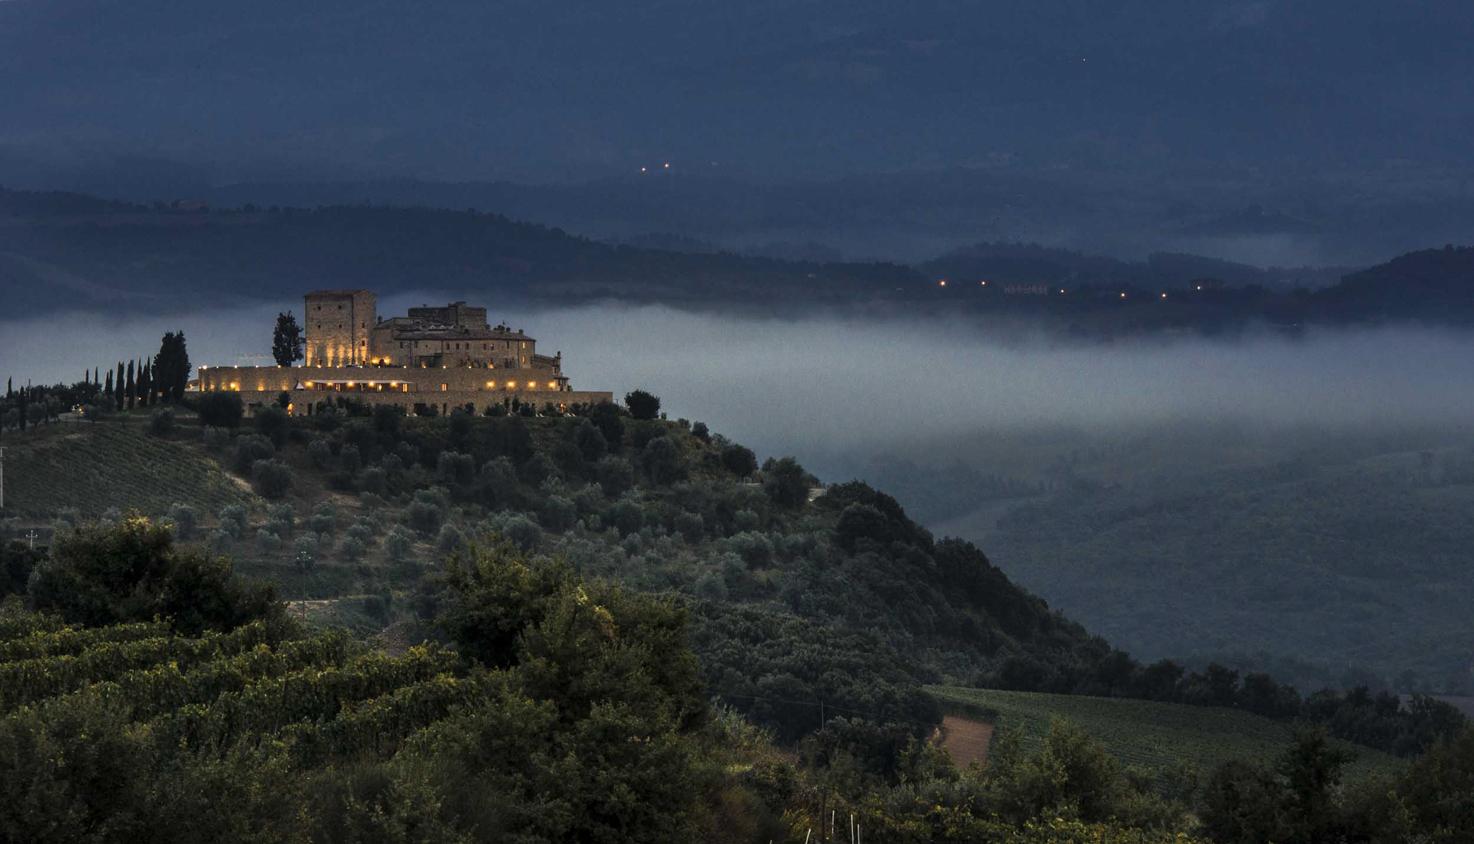 Castello di Velona, Tuscany